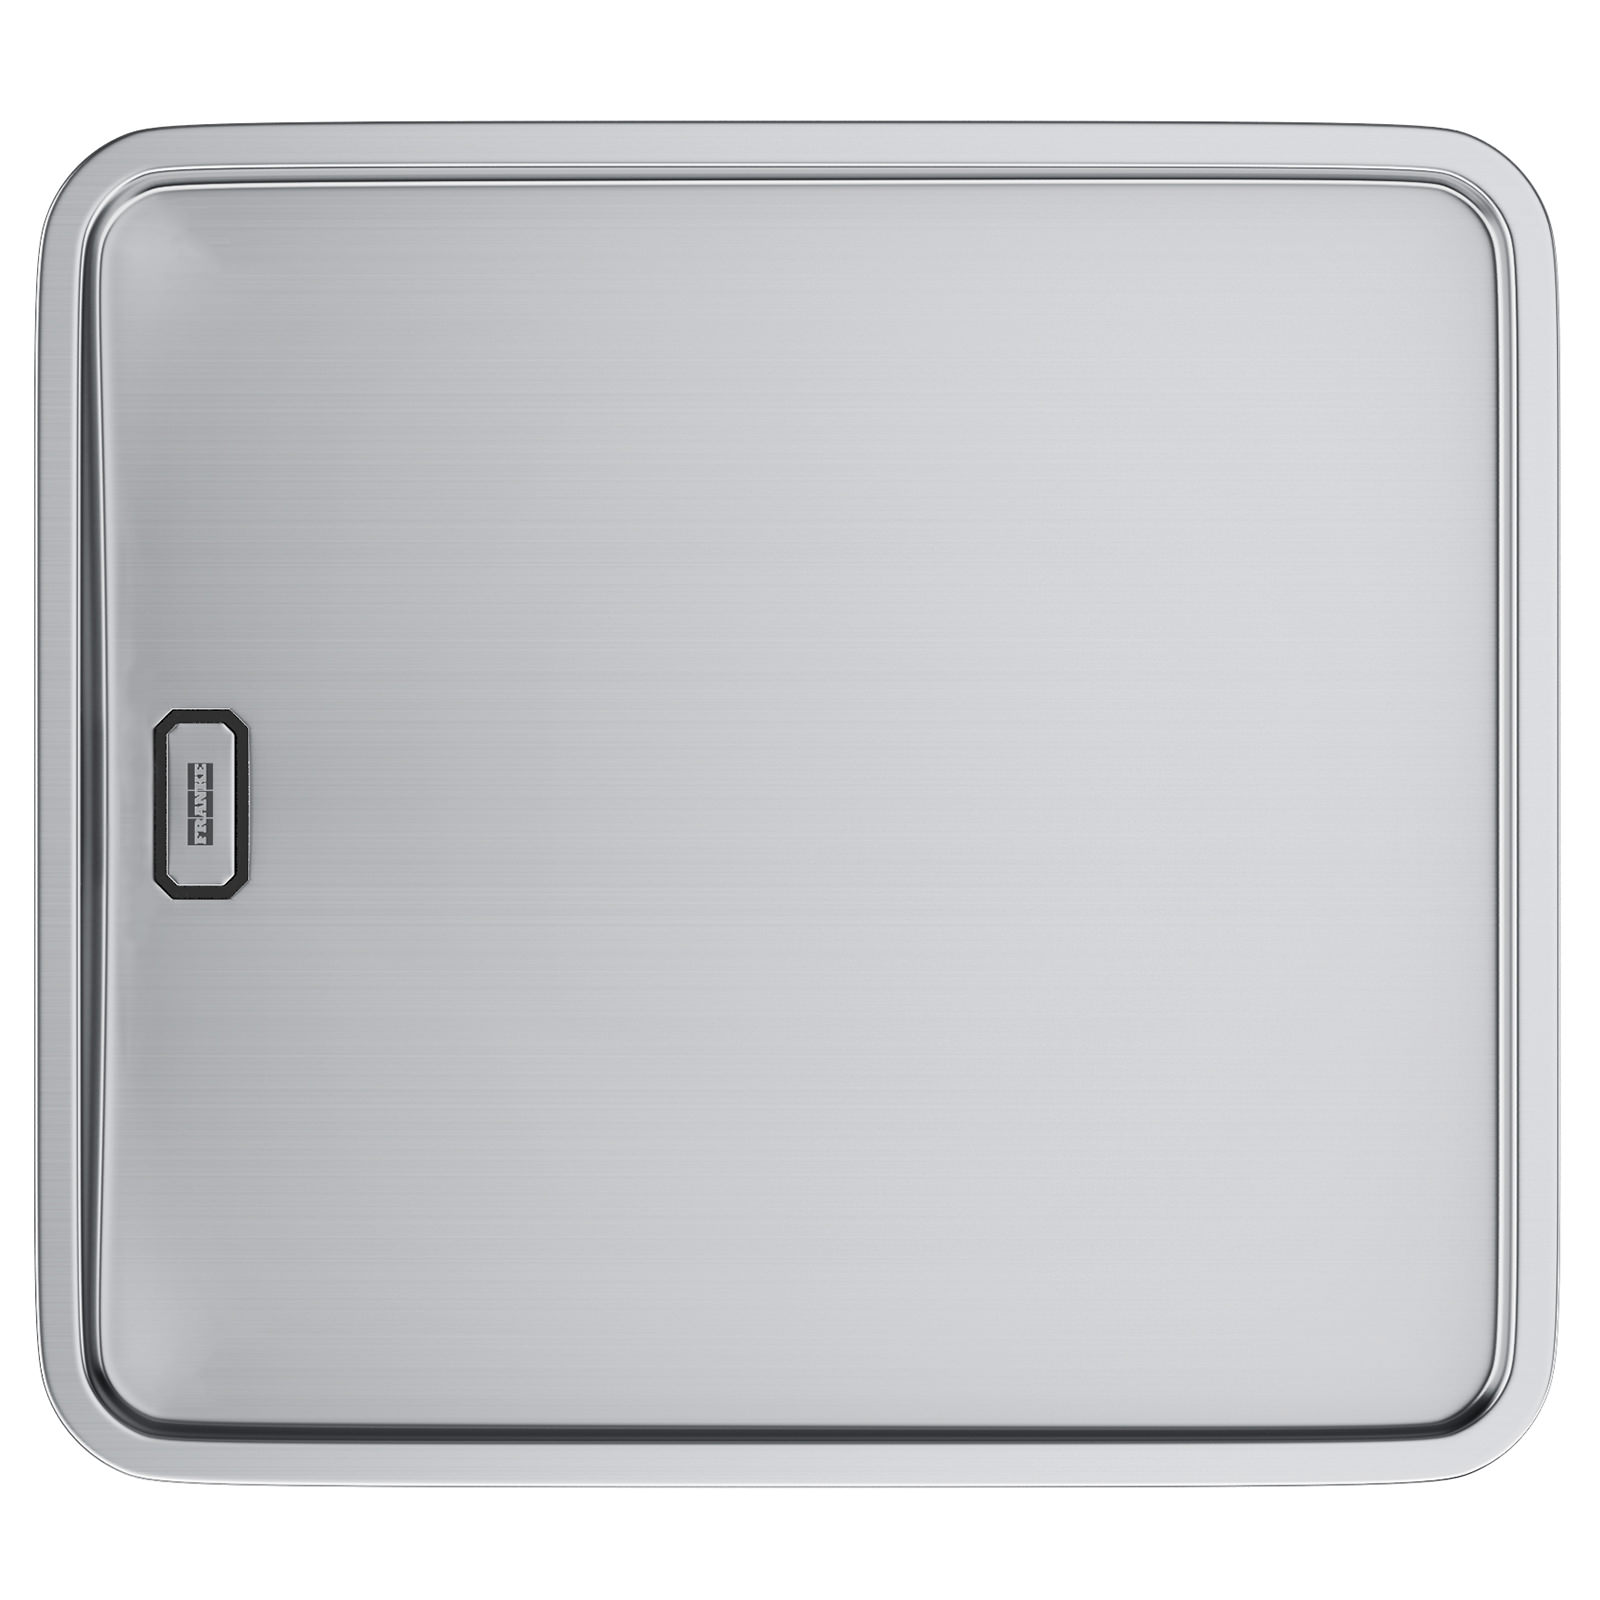 Franke Kubus KBX 104 45 Stainless Steel Undermount Sink Drainer 1120167966